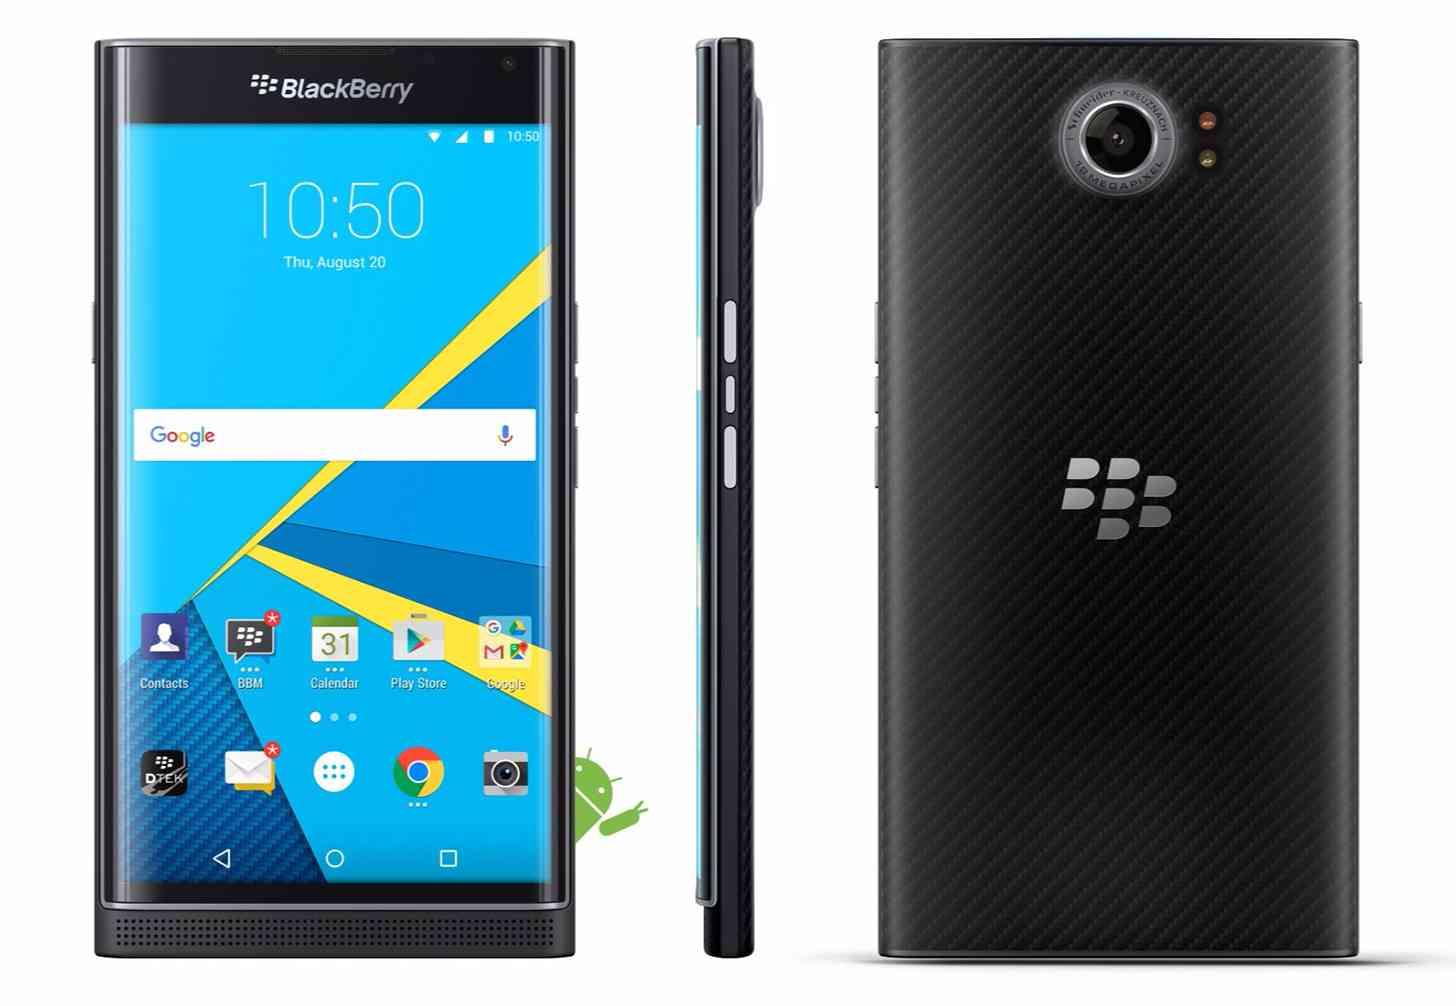 BlackBerry Priv official images